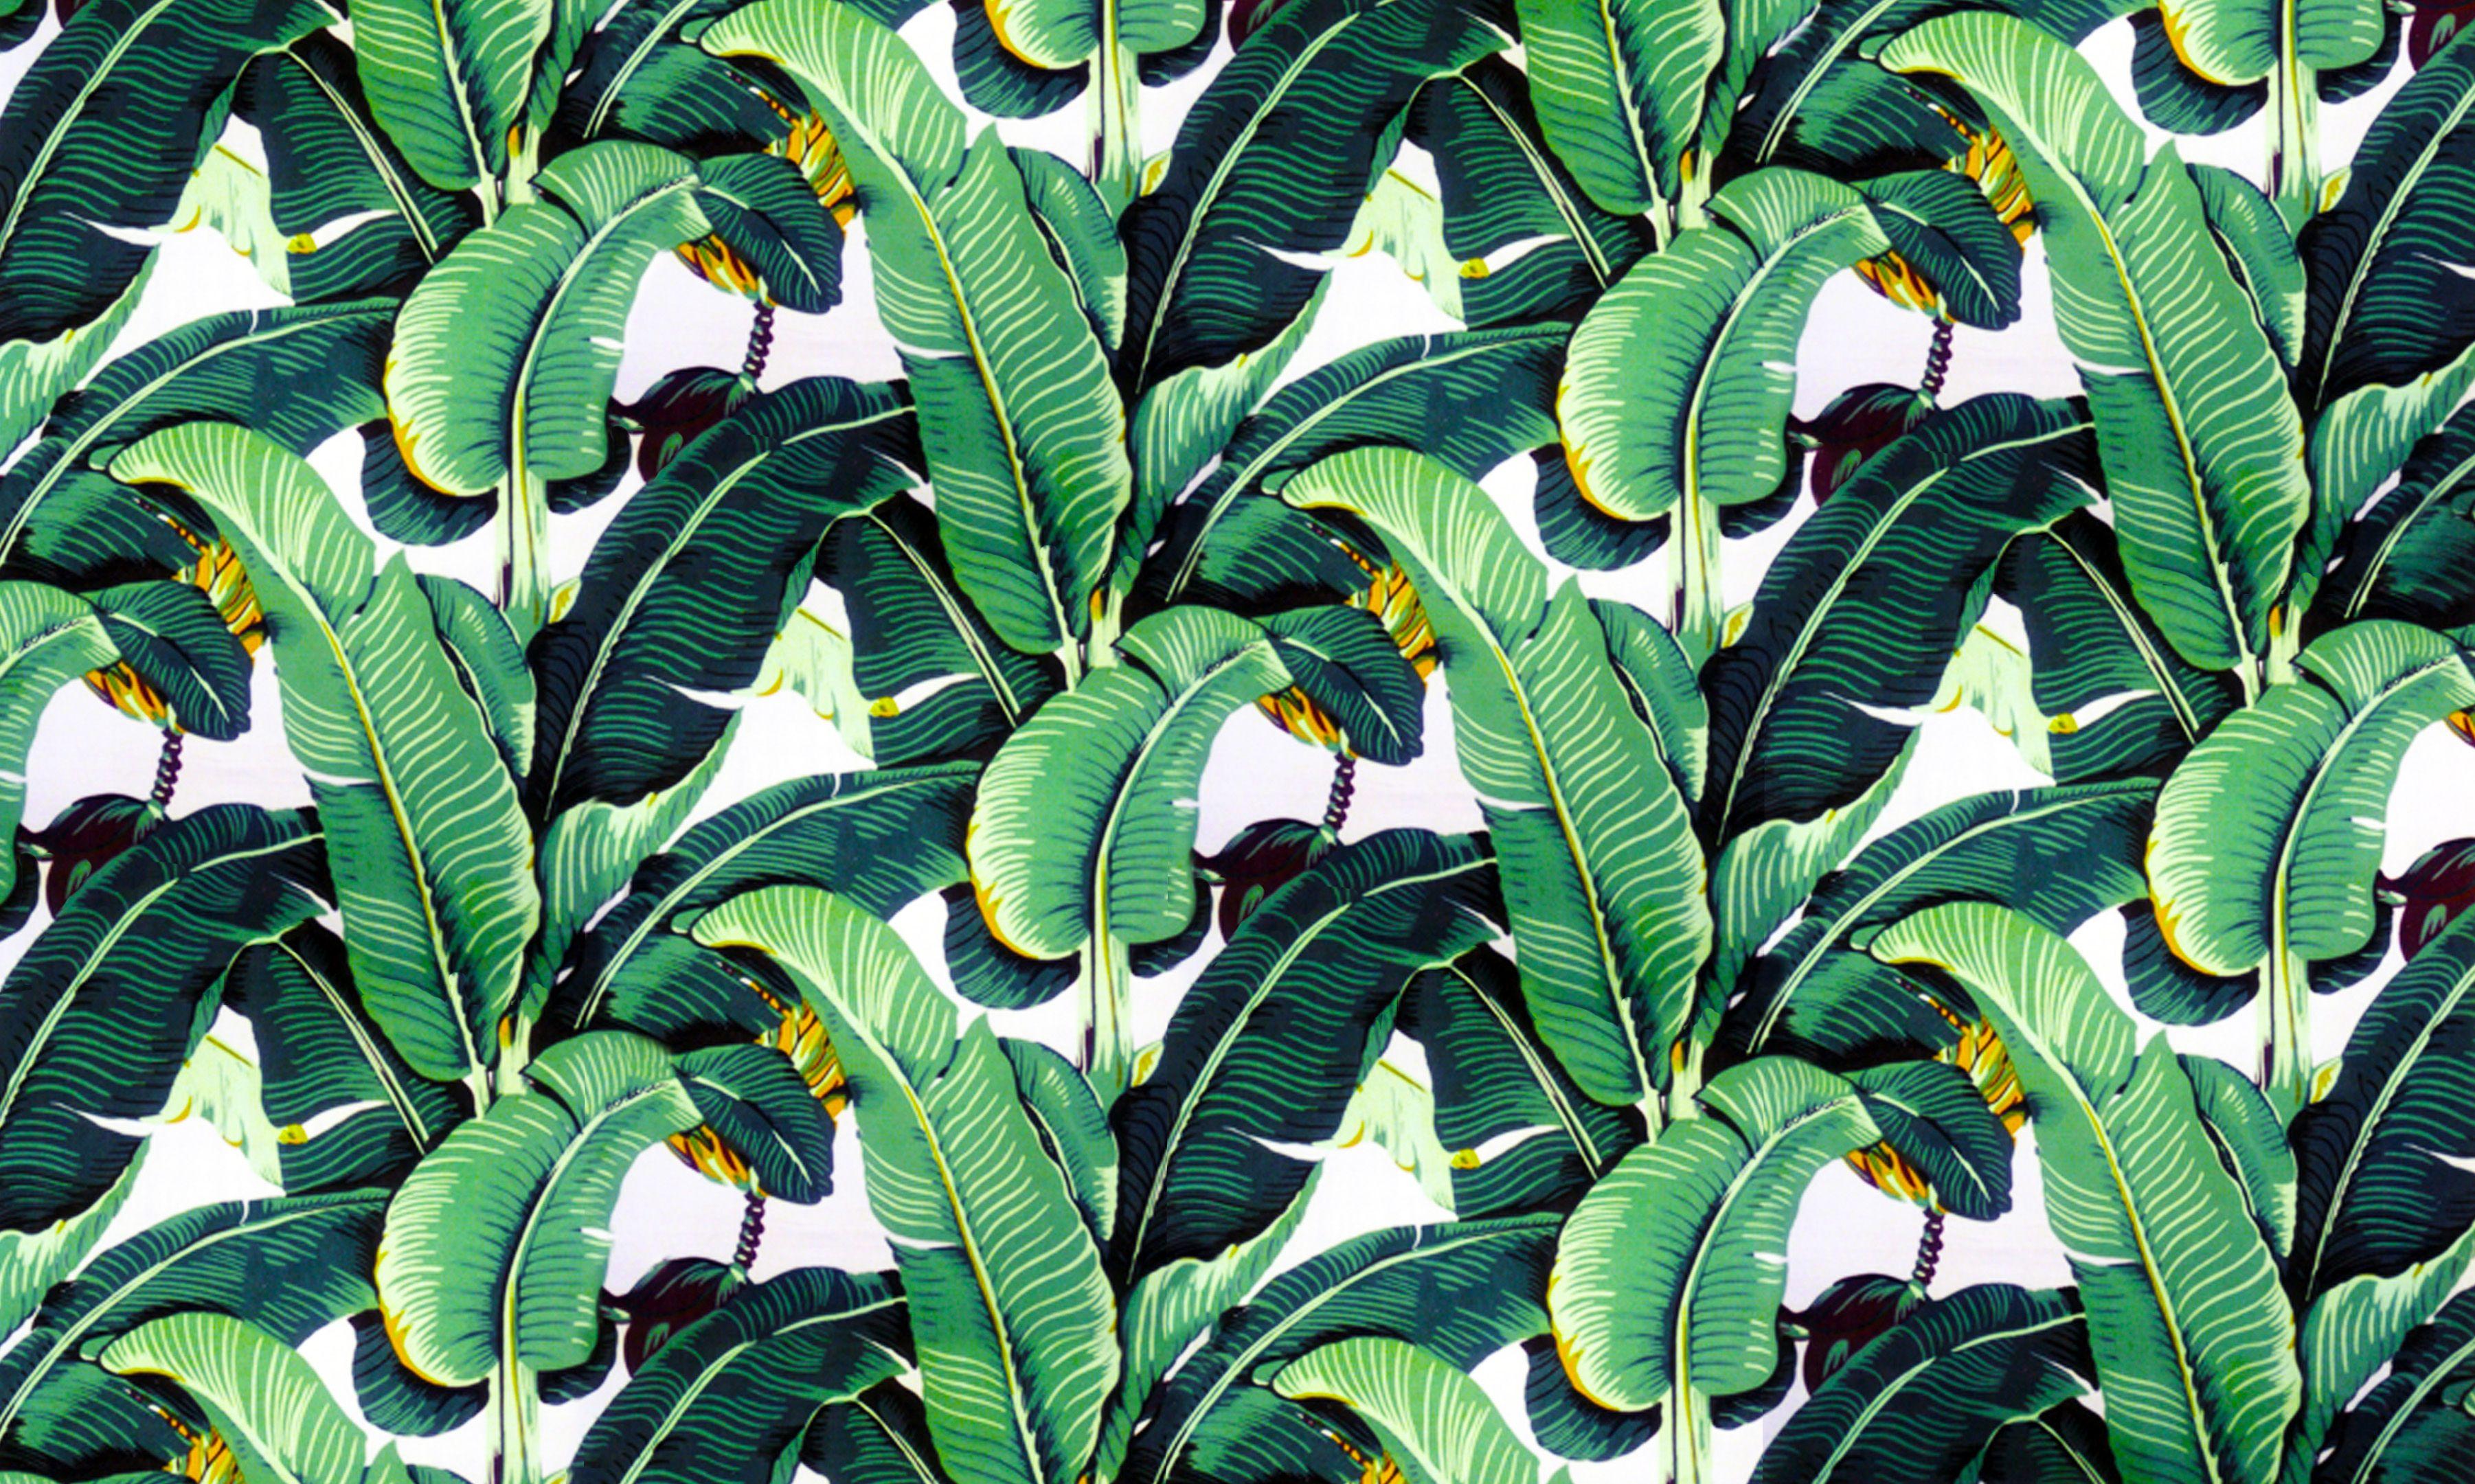 Martinica Wall Tapestry Leaf Wallpaper Banana Leaf Wallpaper Iconic Wallpaper